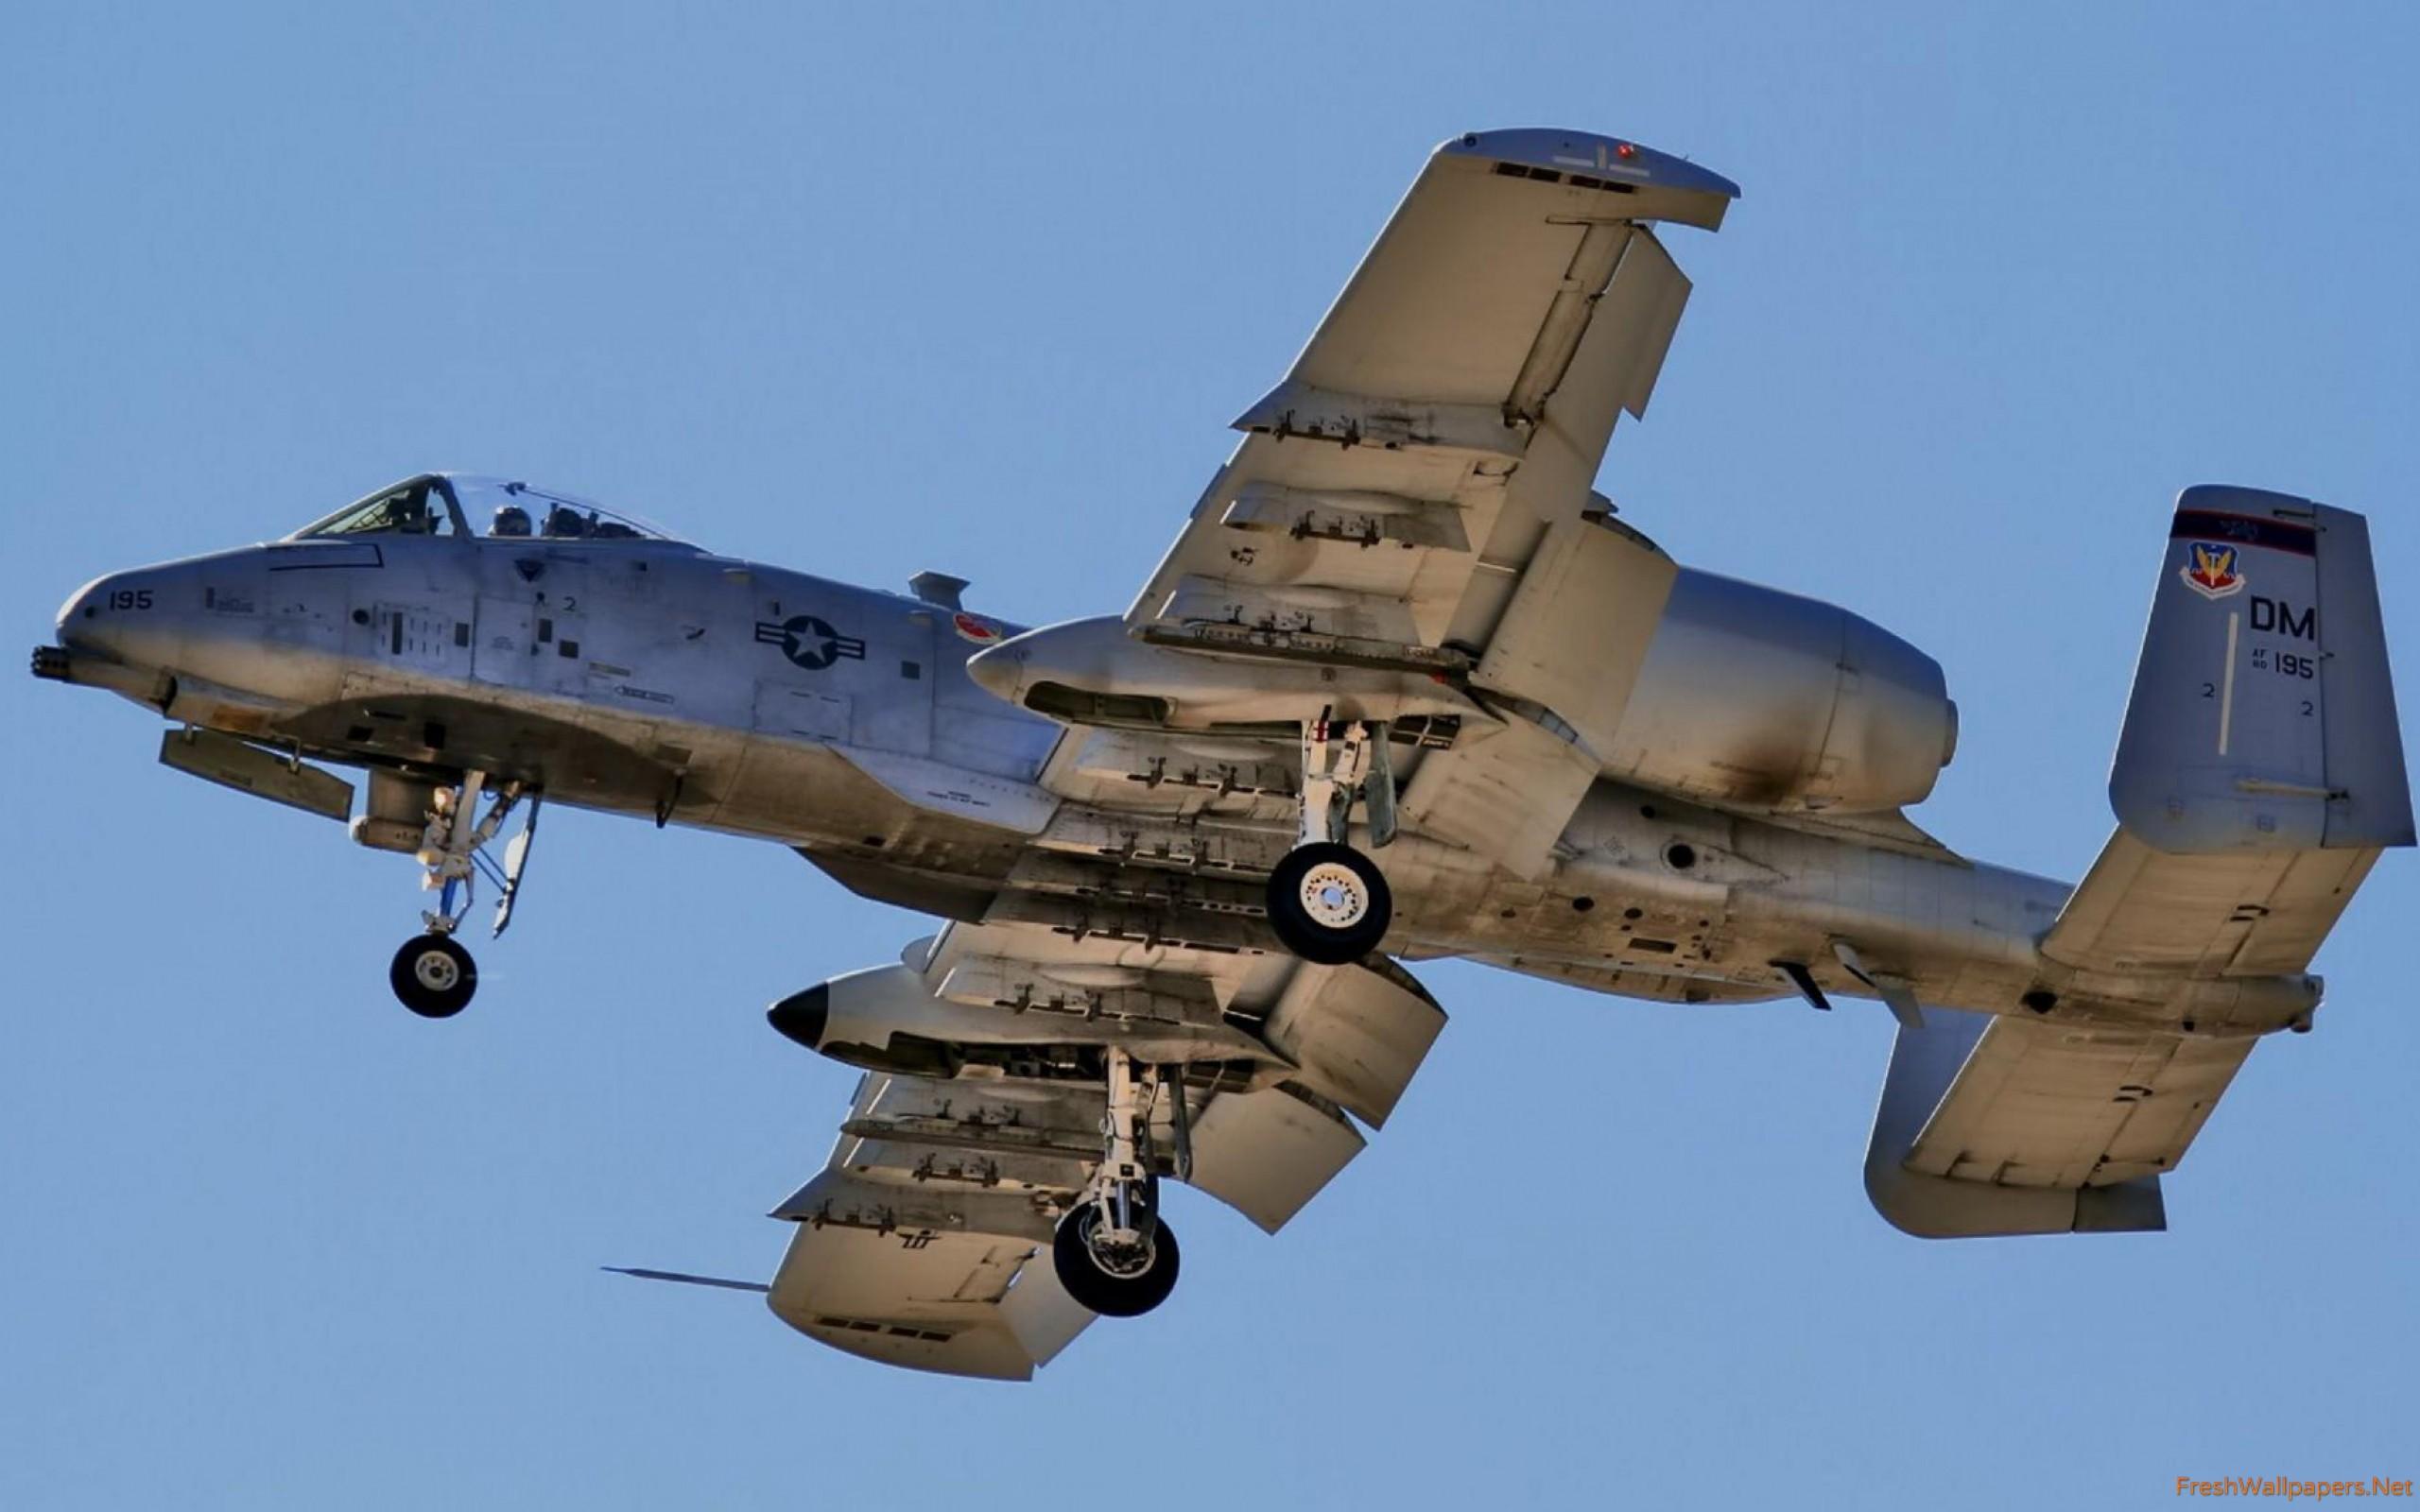 Republic P 47 Thunderbolt preparing to land wallpapers 2560x1600